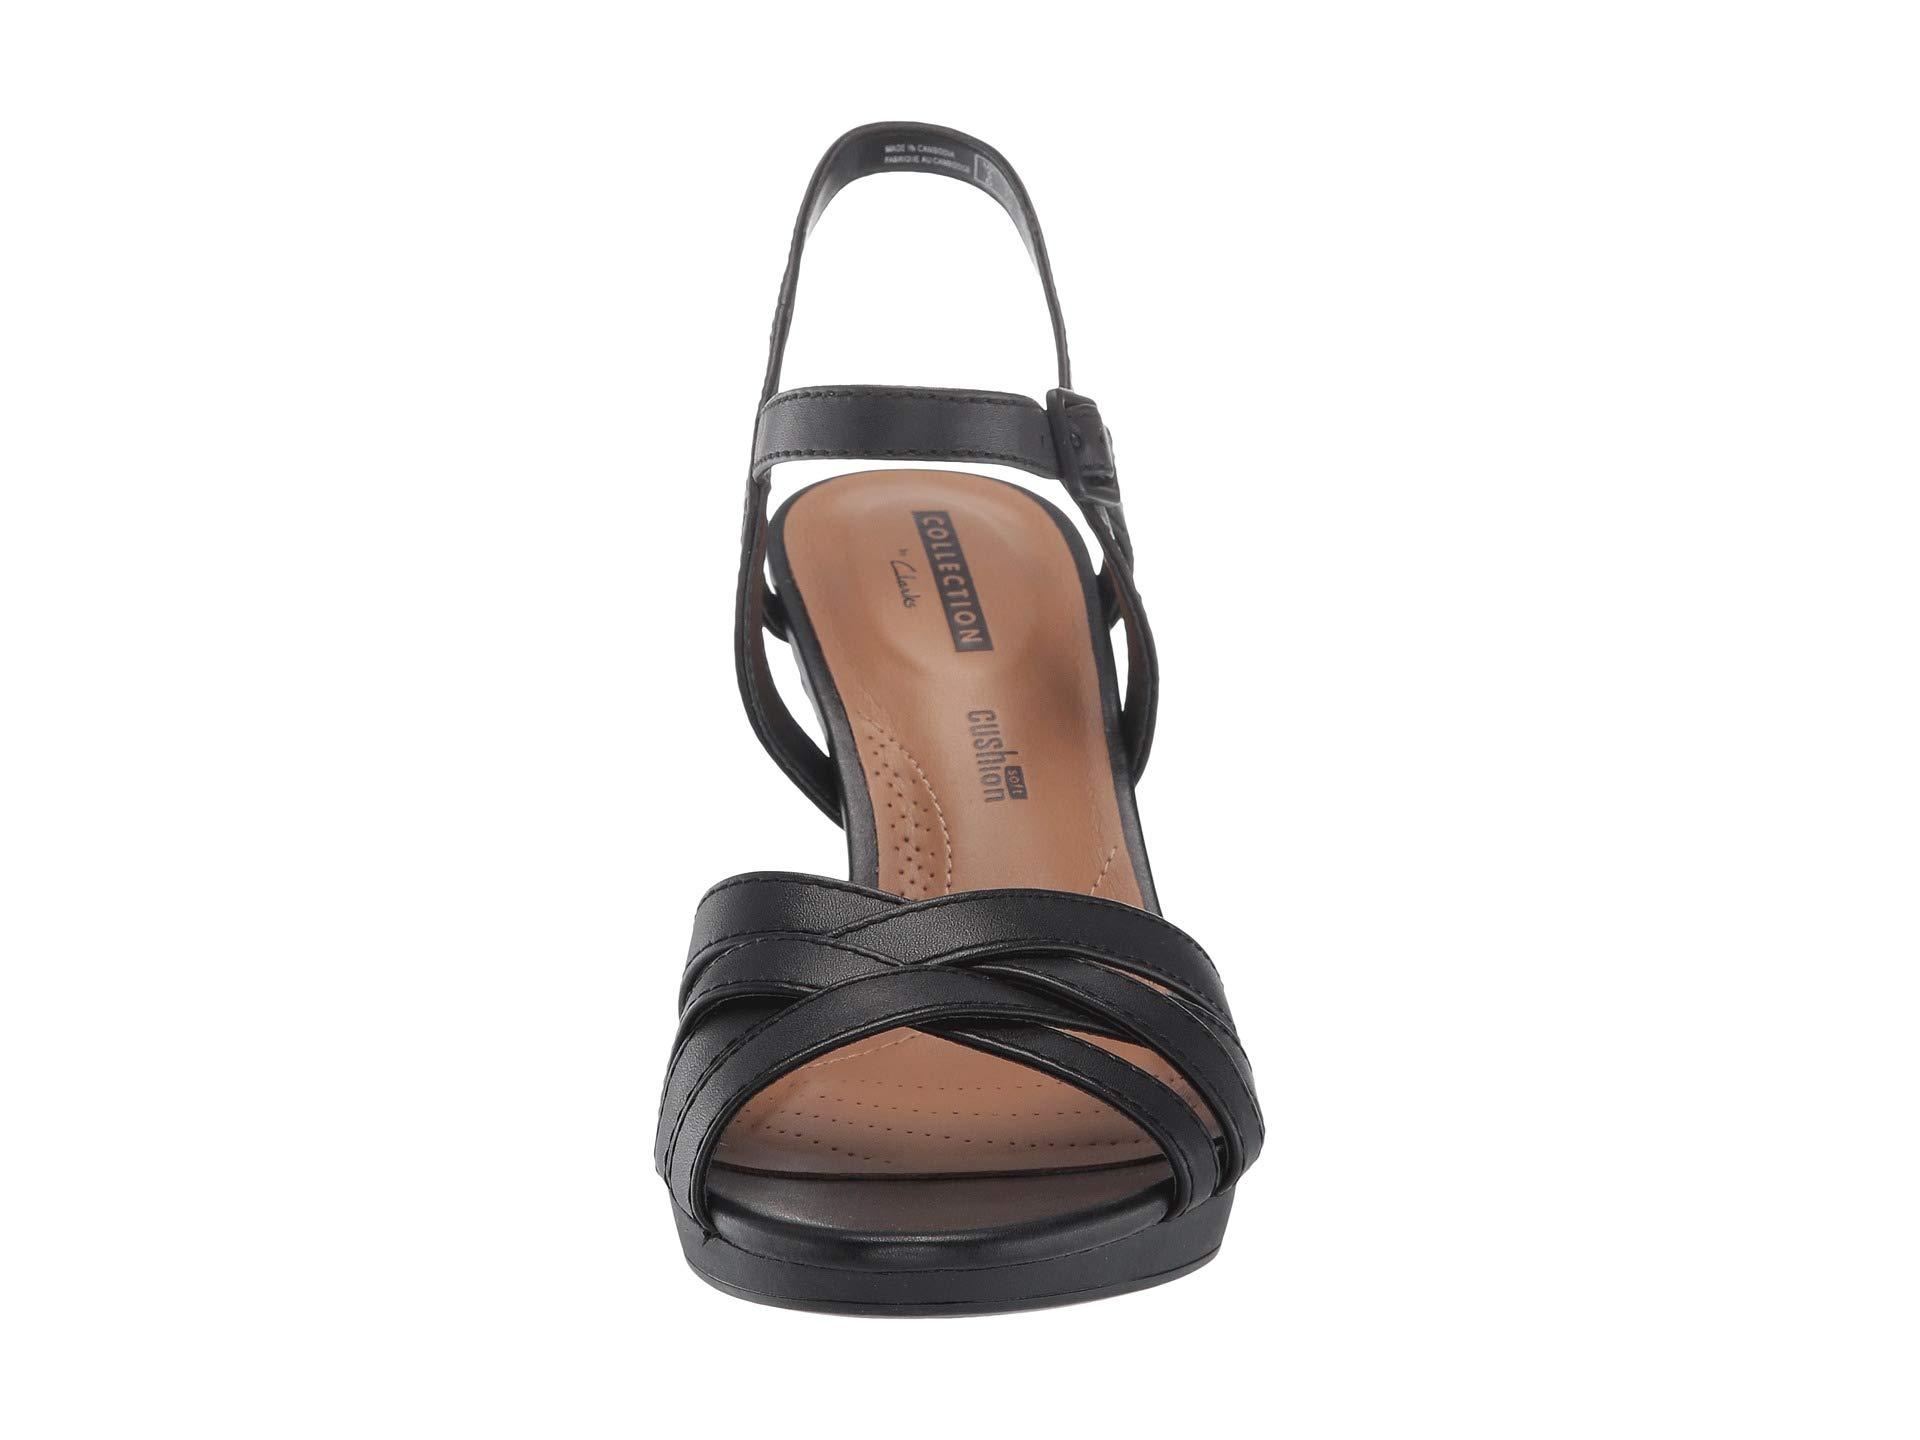 0e3f780c1dcc Clarks - Adriel Wavy (black Leather) High Heels - Lyst. View fullscreen